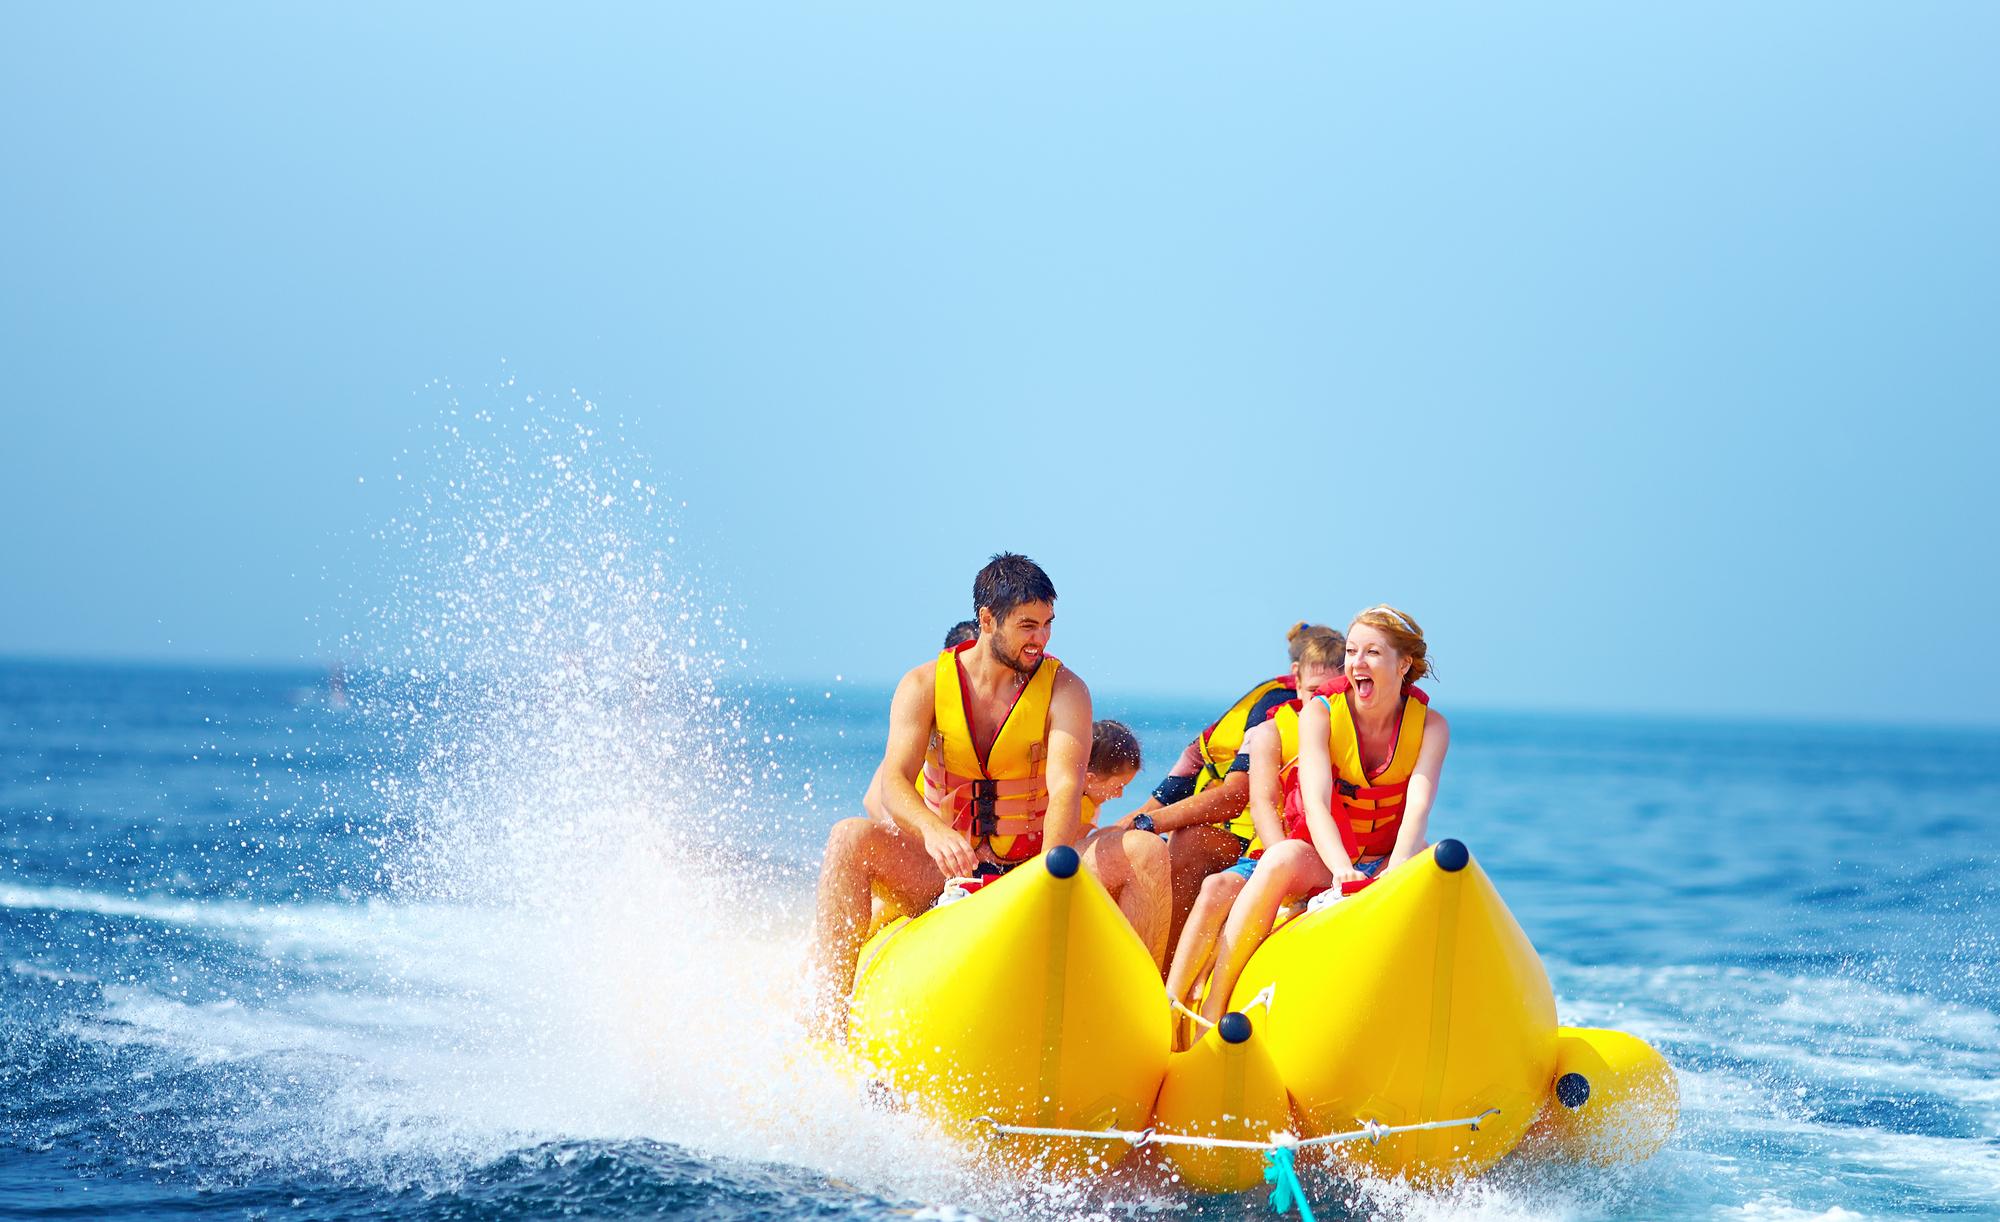 Banana boat ride with friends in Boracay Island